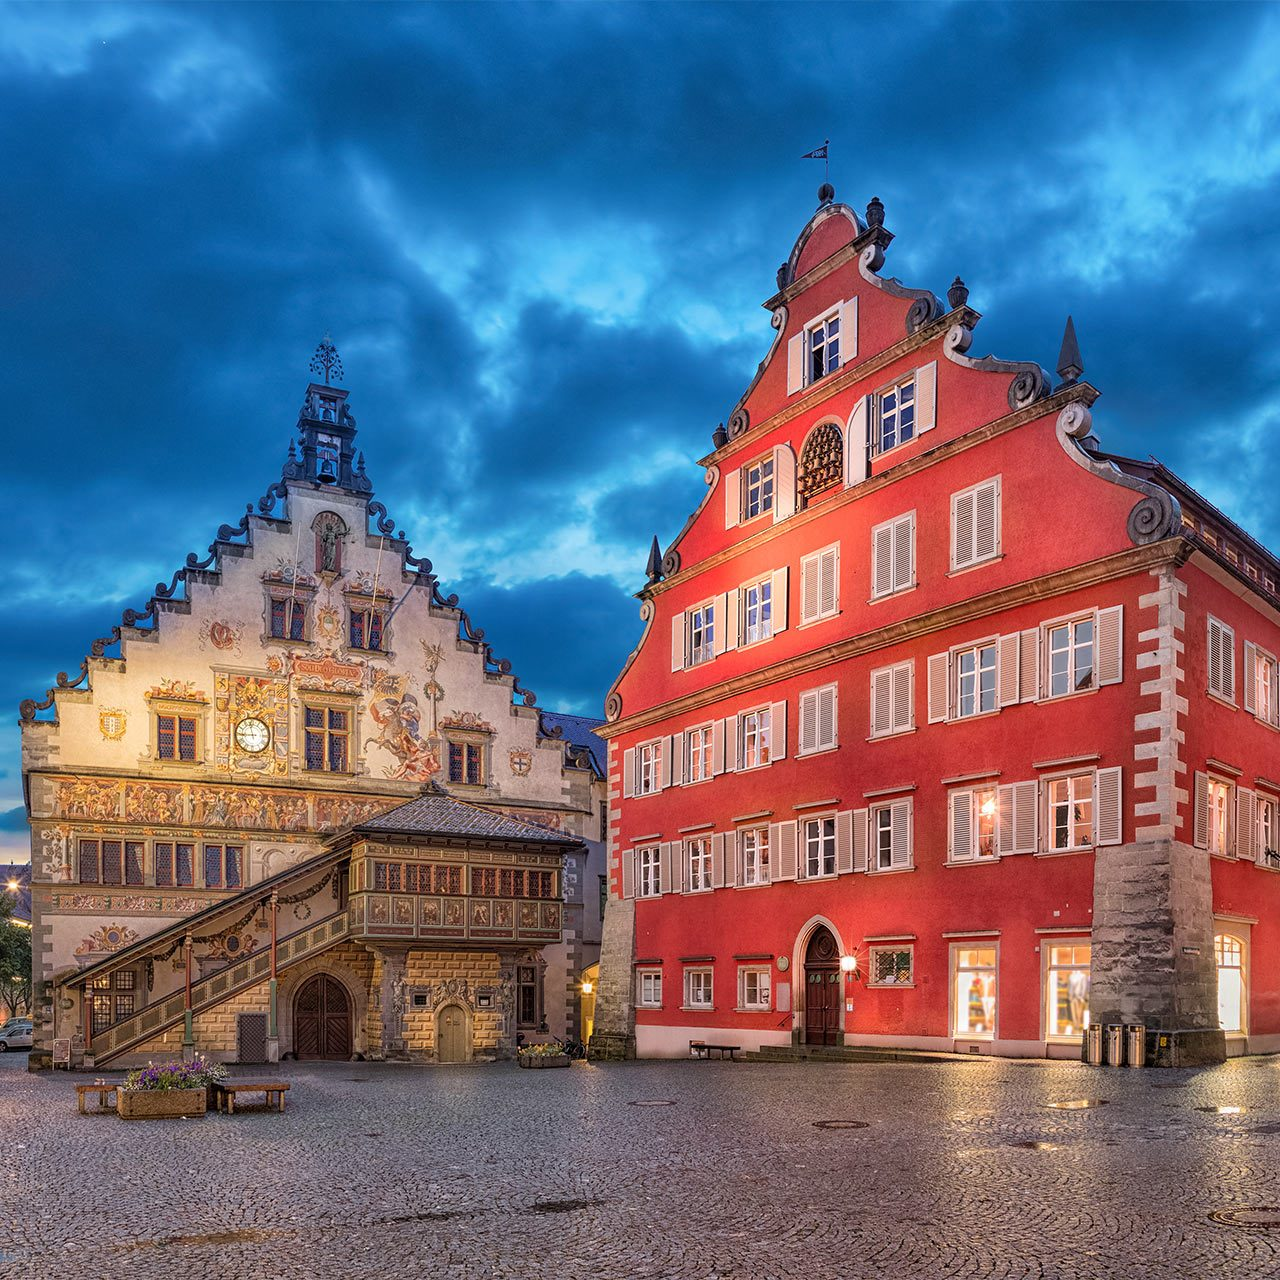 Lindau-Bodensee-Rathaus